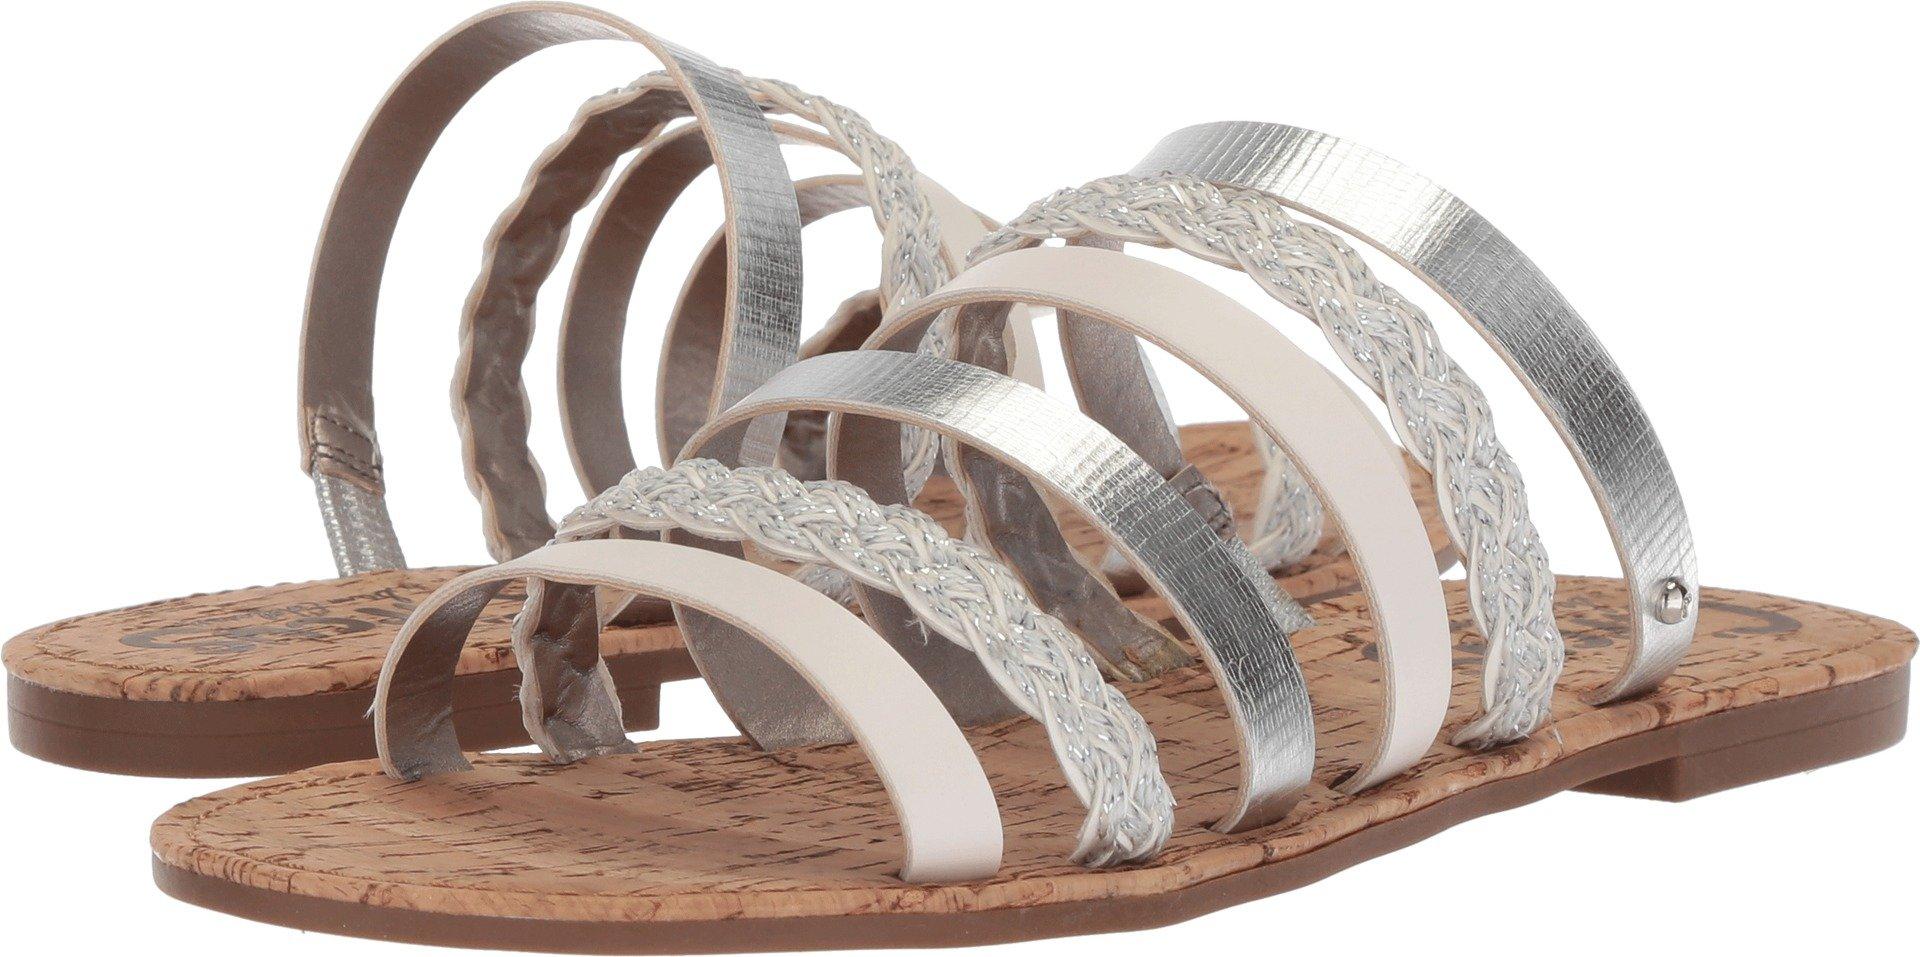 Circus by Sam Edelman Women's Braiden Slide Sandal, Soft Silver/Bright White, 8 M US